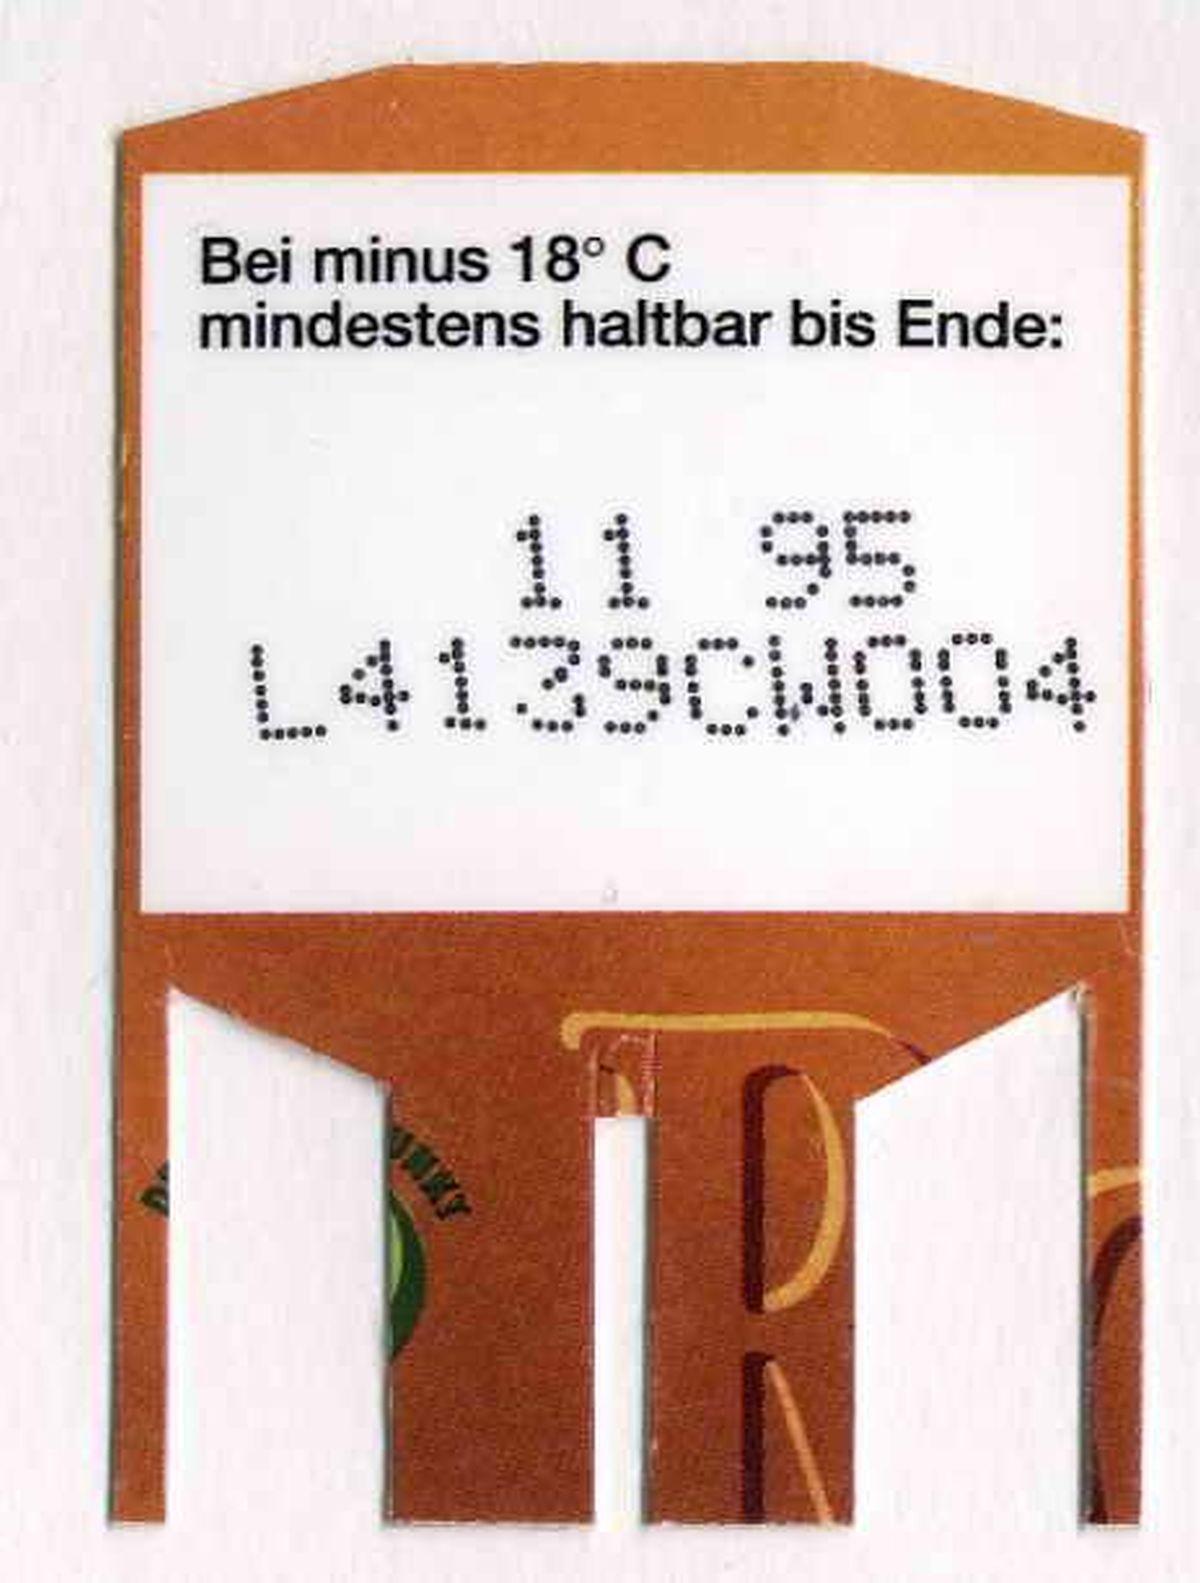 Bob Lens - Handsignierter UNIKATER CUTTERMESSER SCHNITT FLUXUS 1994 kopen? Bied vanaf 65!